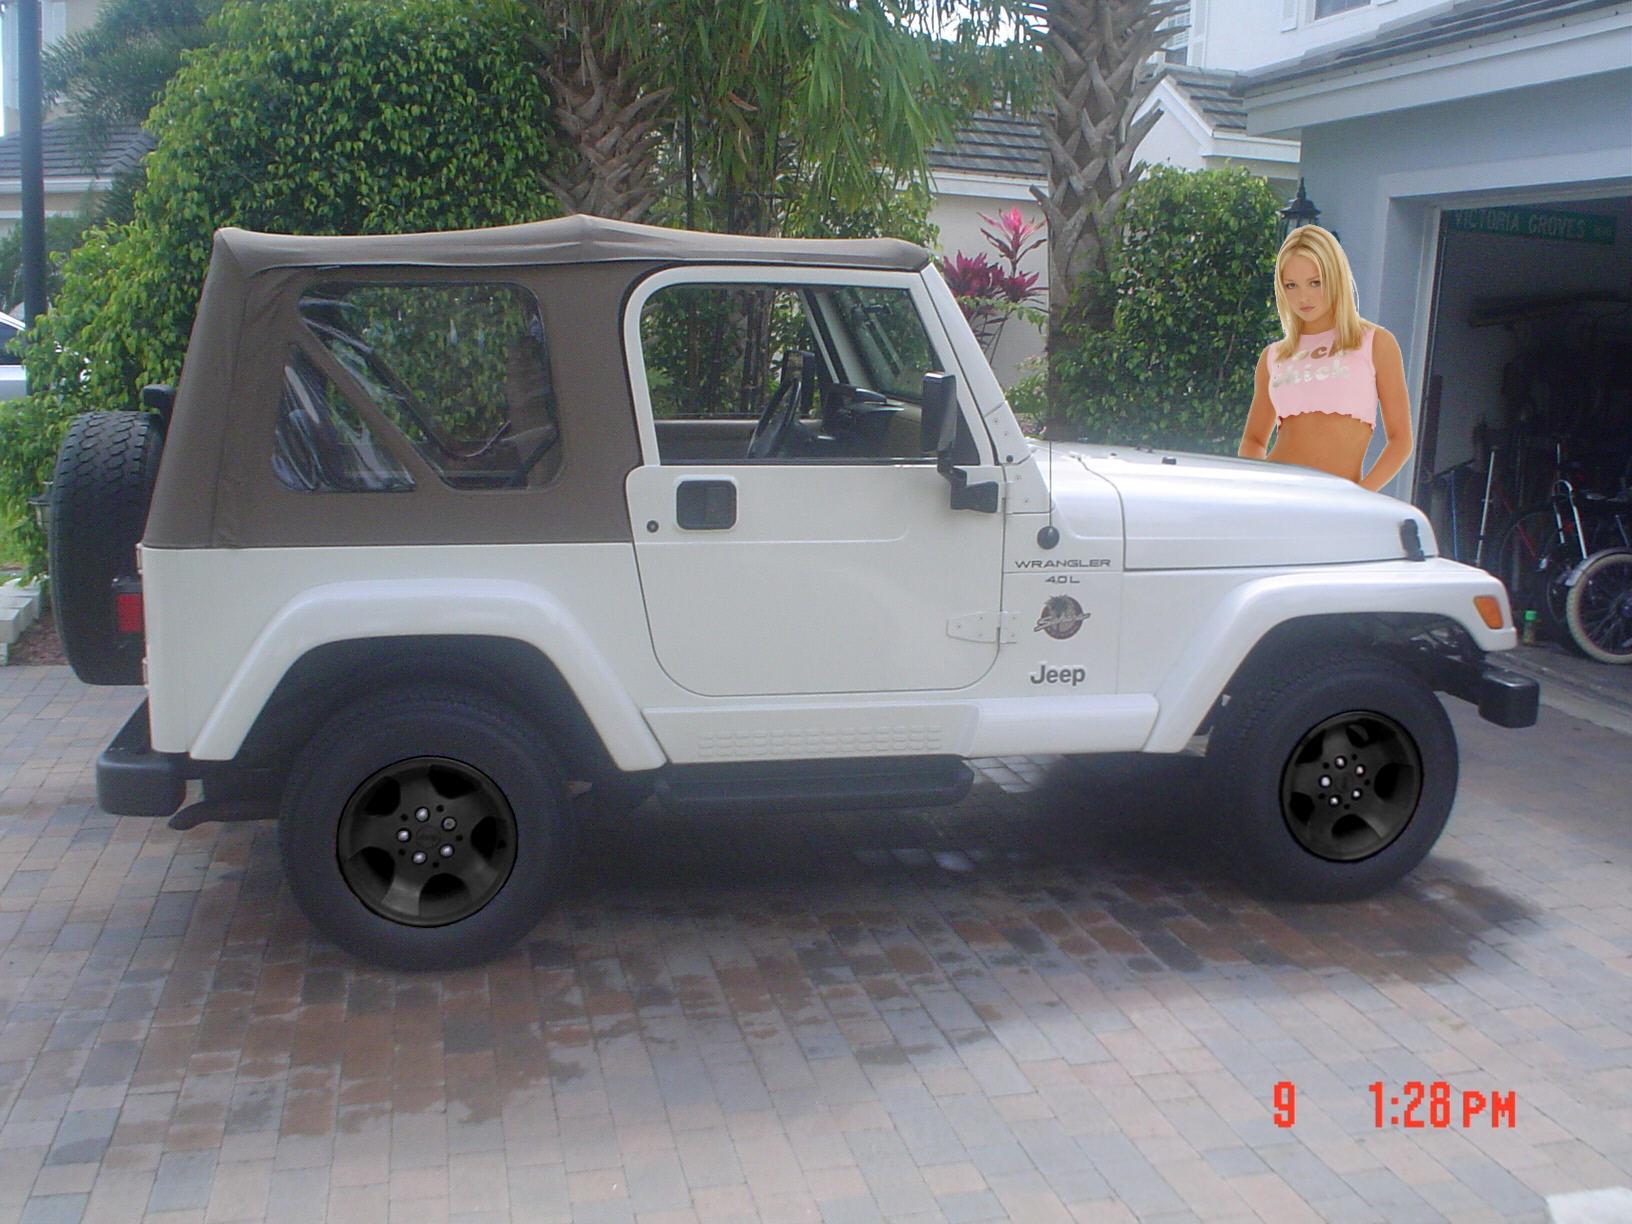 jeep-2000-008a.jpg